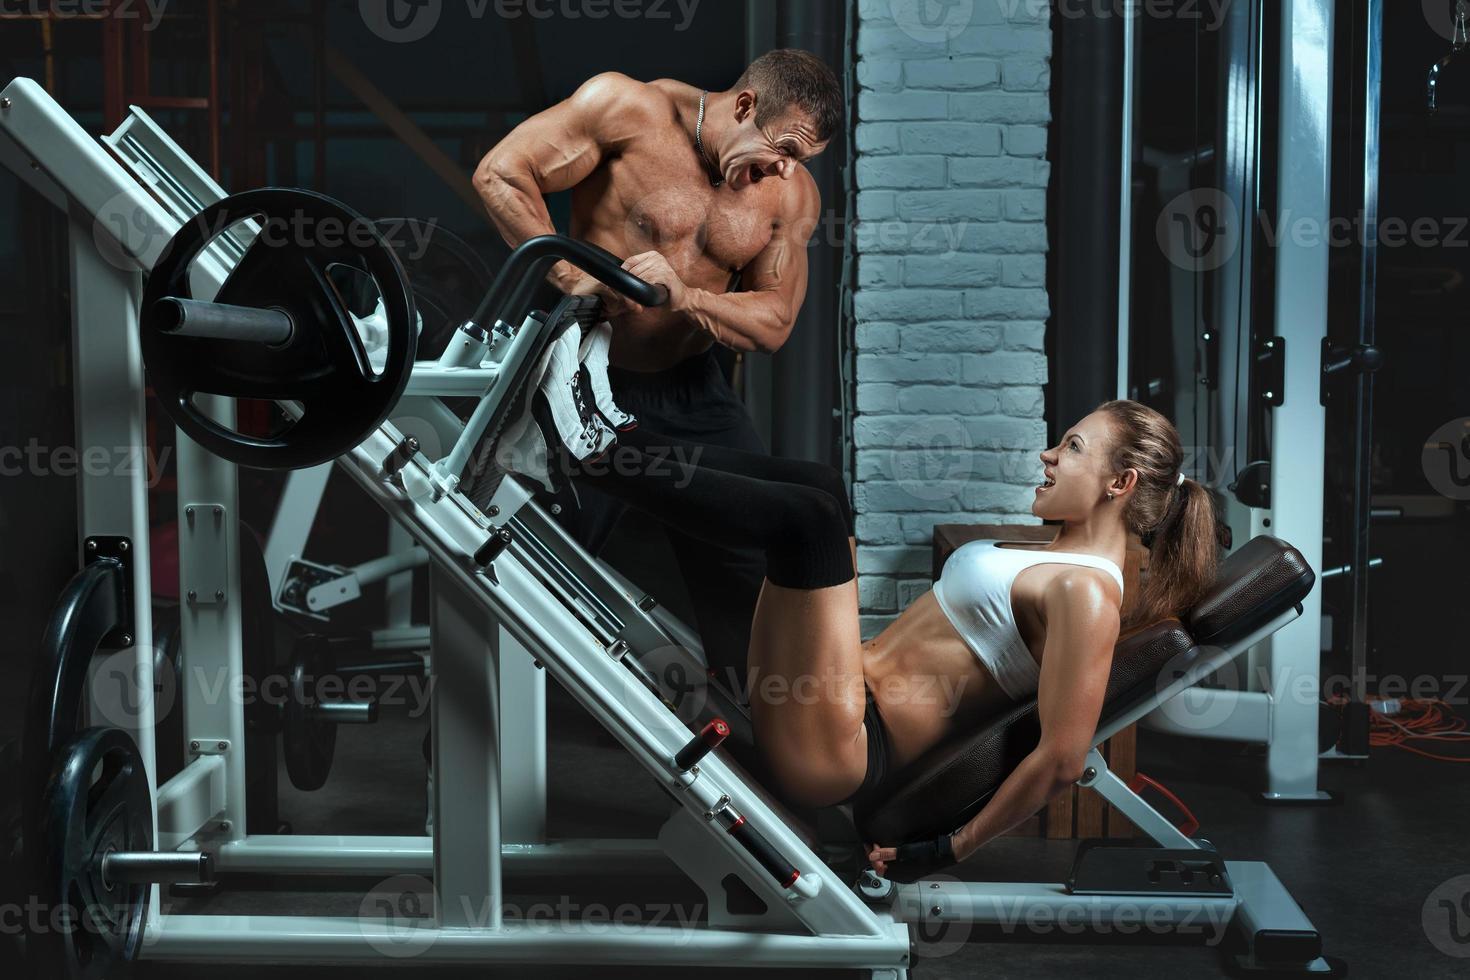 bodybuilder uomo allena una donna. foto